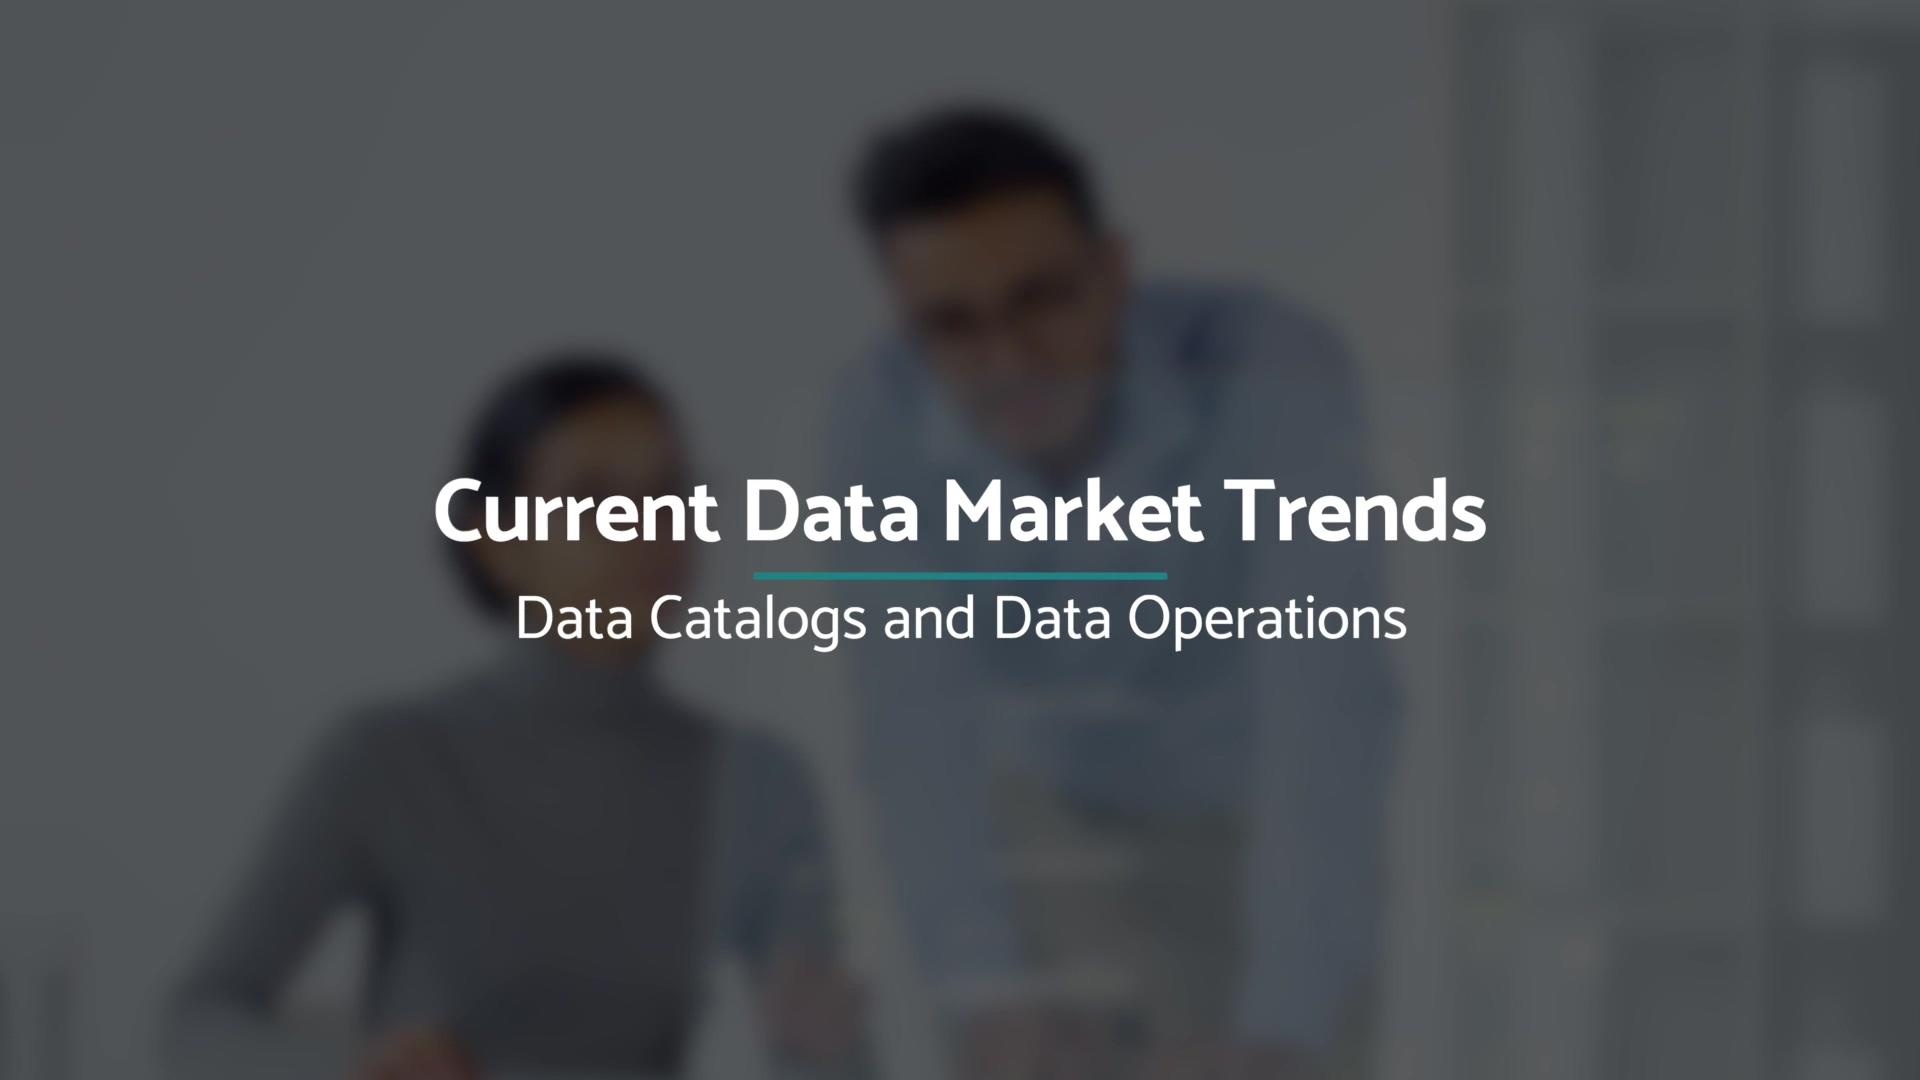 VR VentanaCast Current Data Market Trends 2020